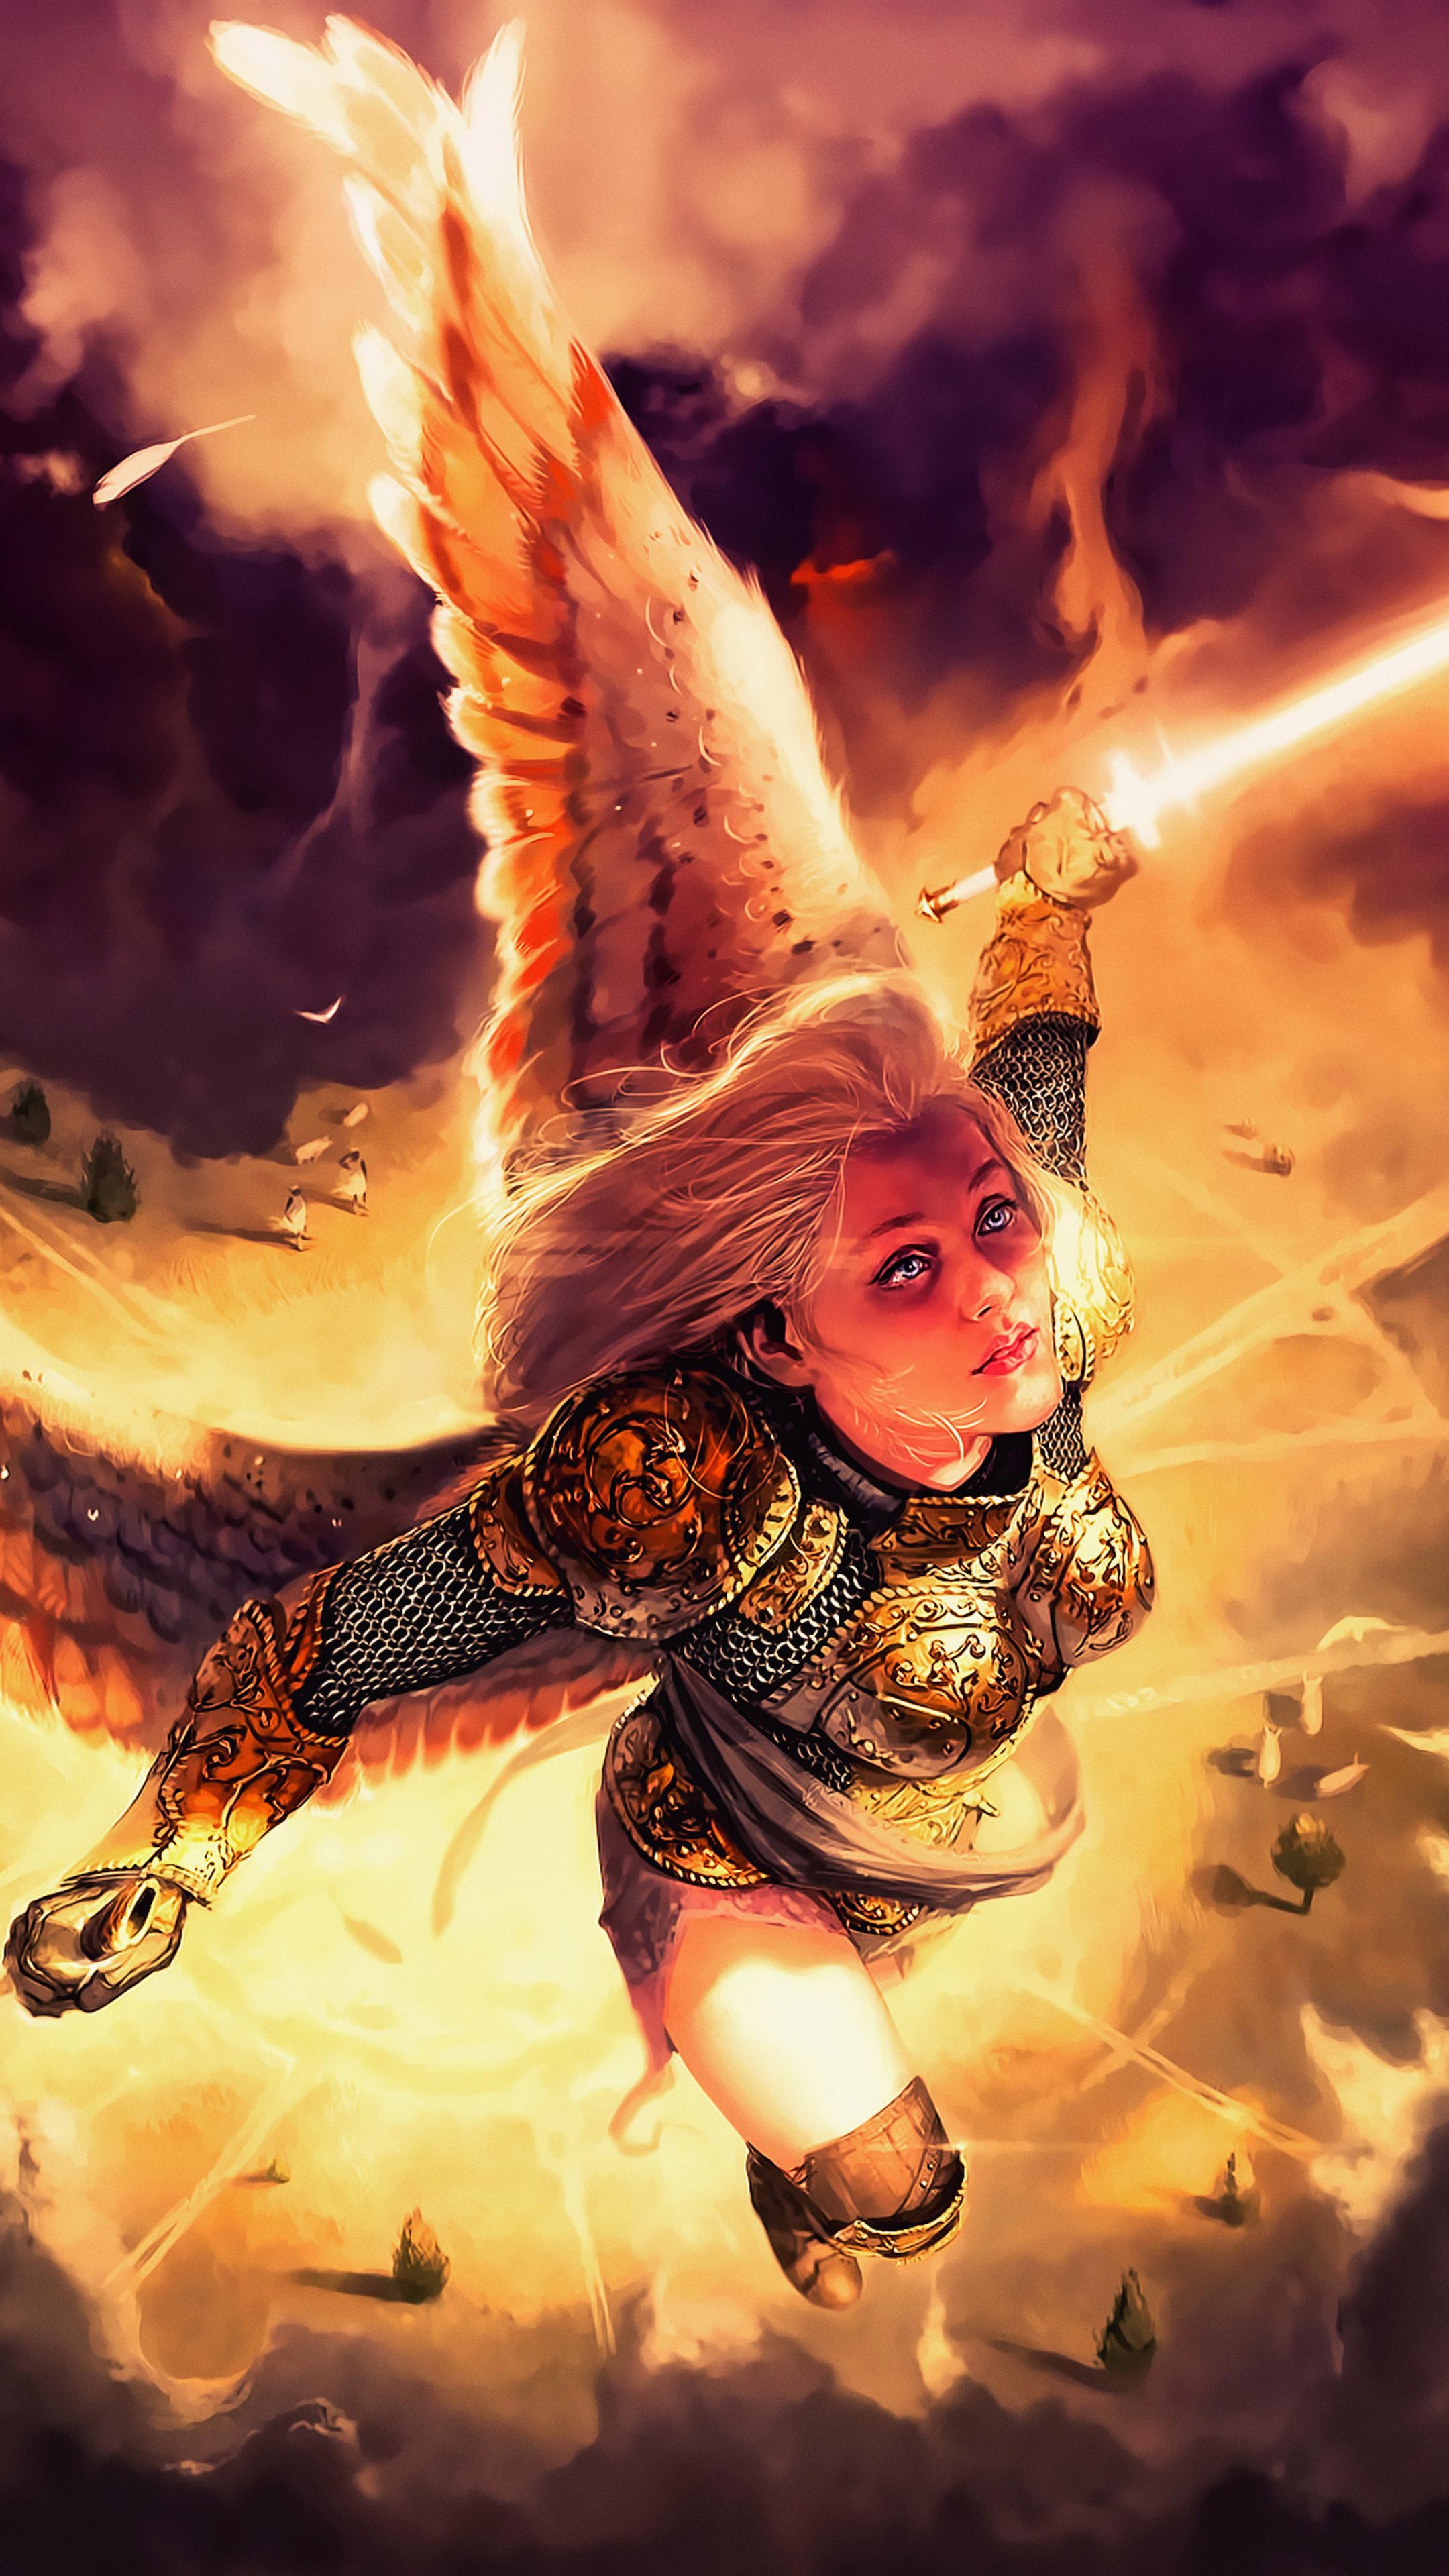 gold-angel-fantasy-girl-with-wings-4k-ce.jpg